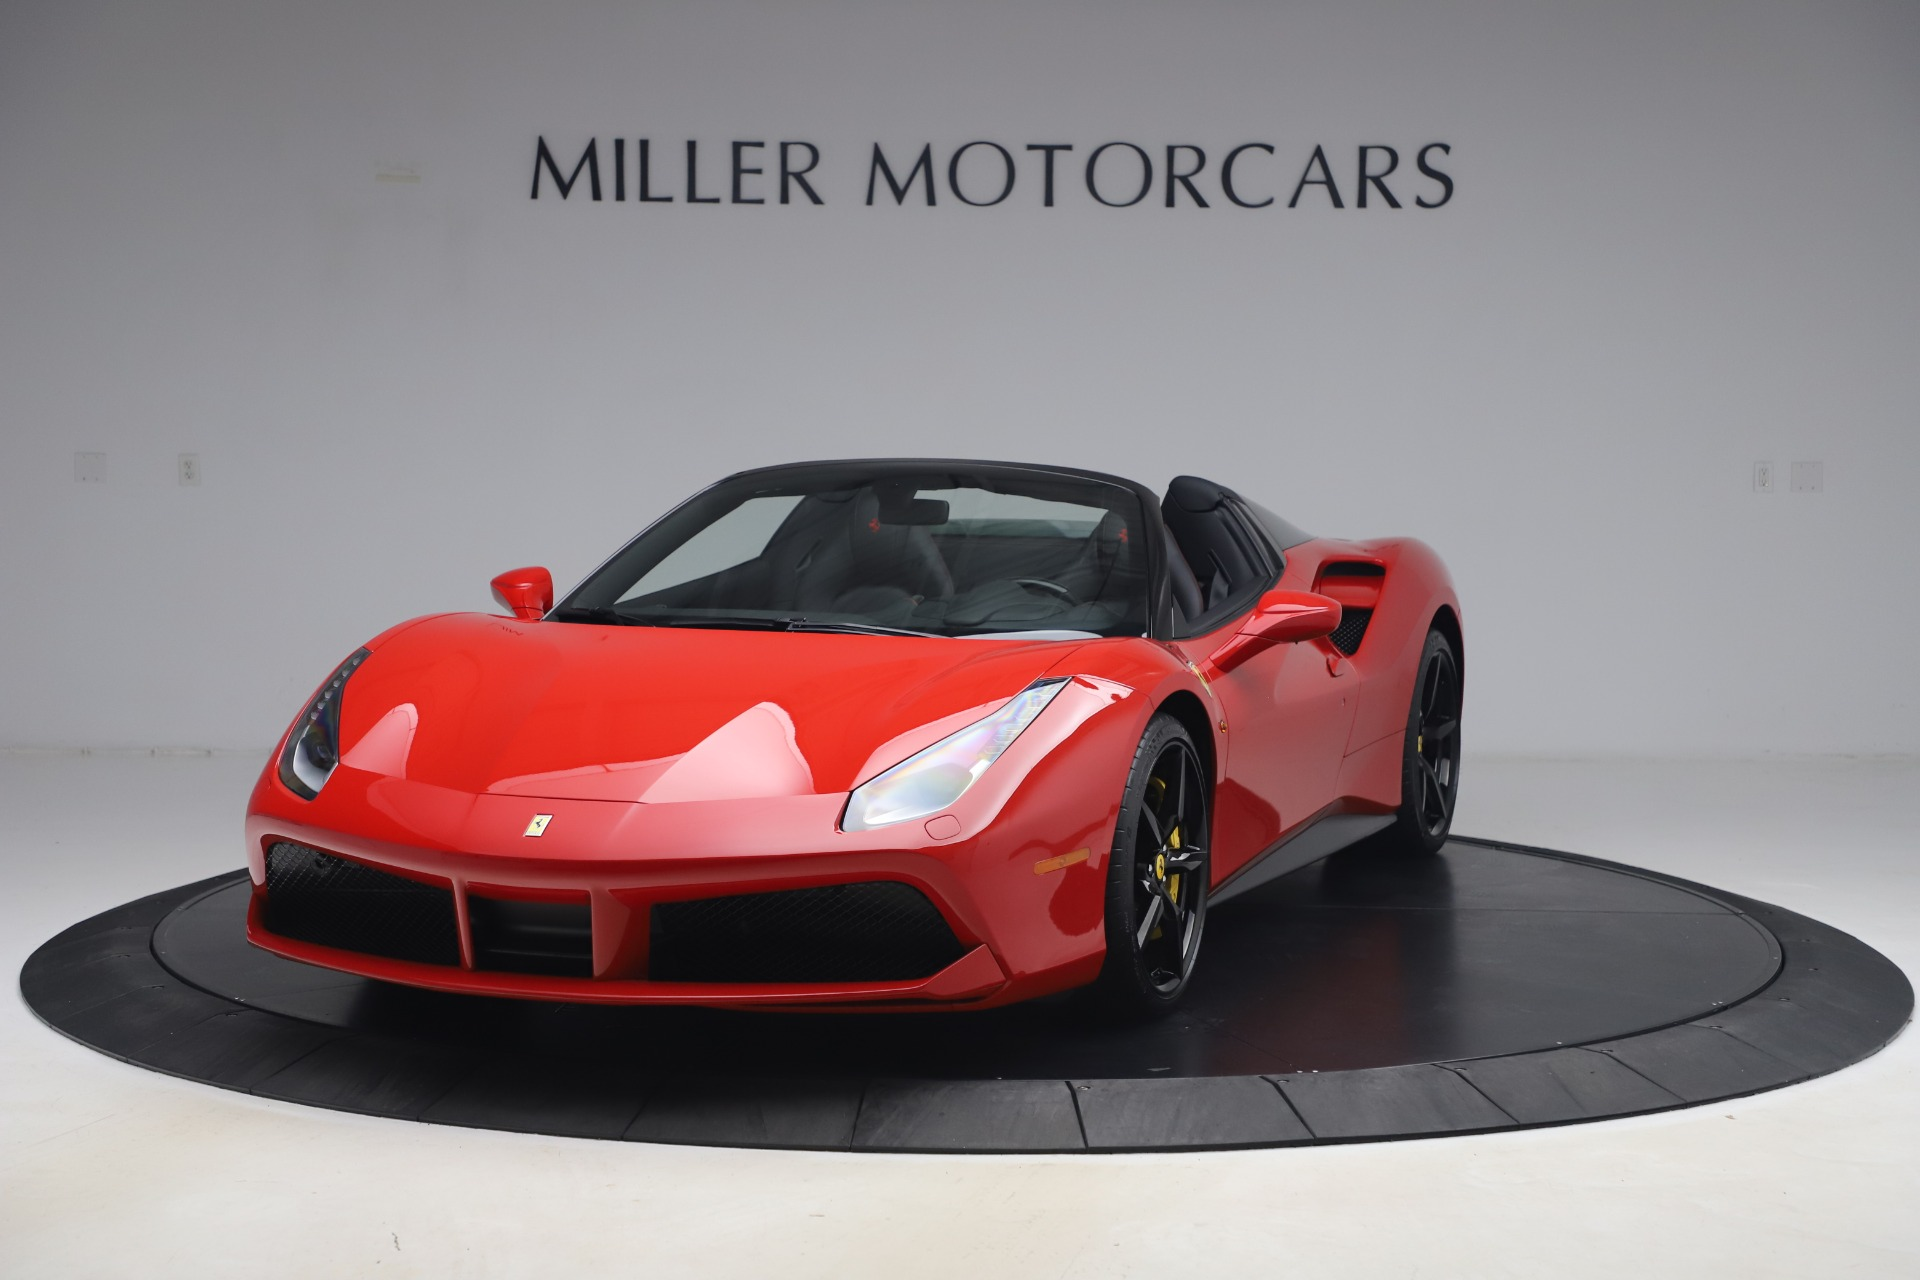 Used 2018 Ferrari 488 Spider for sale $286,900 at Alfa Romeo of Westport in Westport CT 06880 1